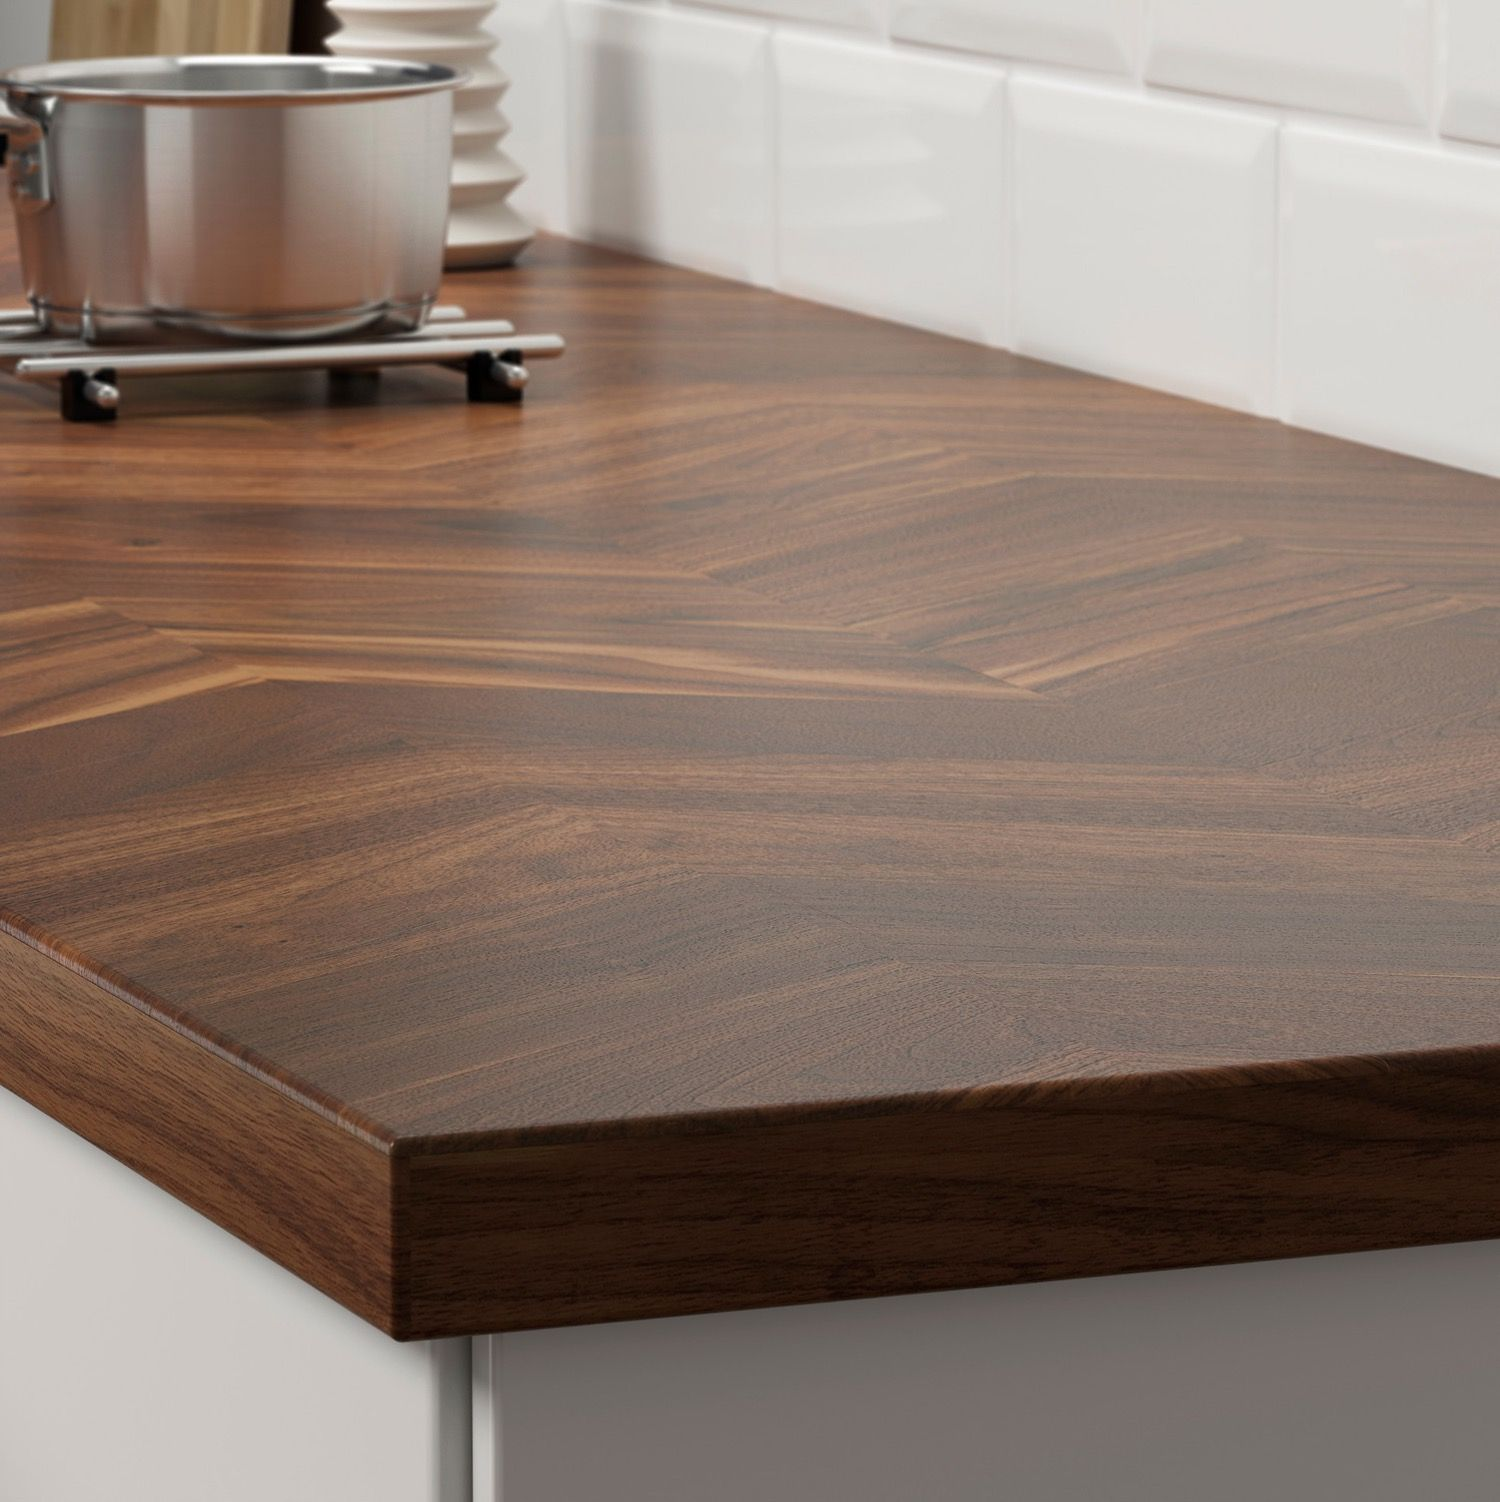 Ikea Kitchen Counter: #9: BARKABODA Wood Countertop